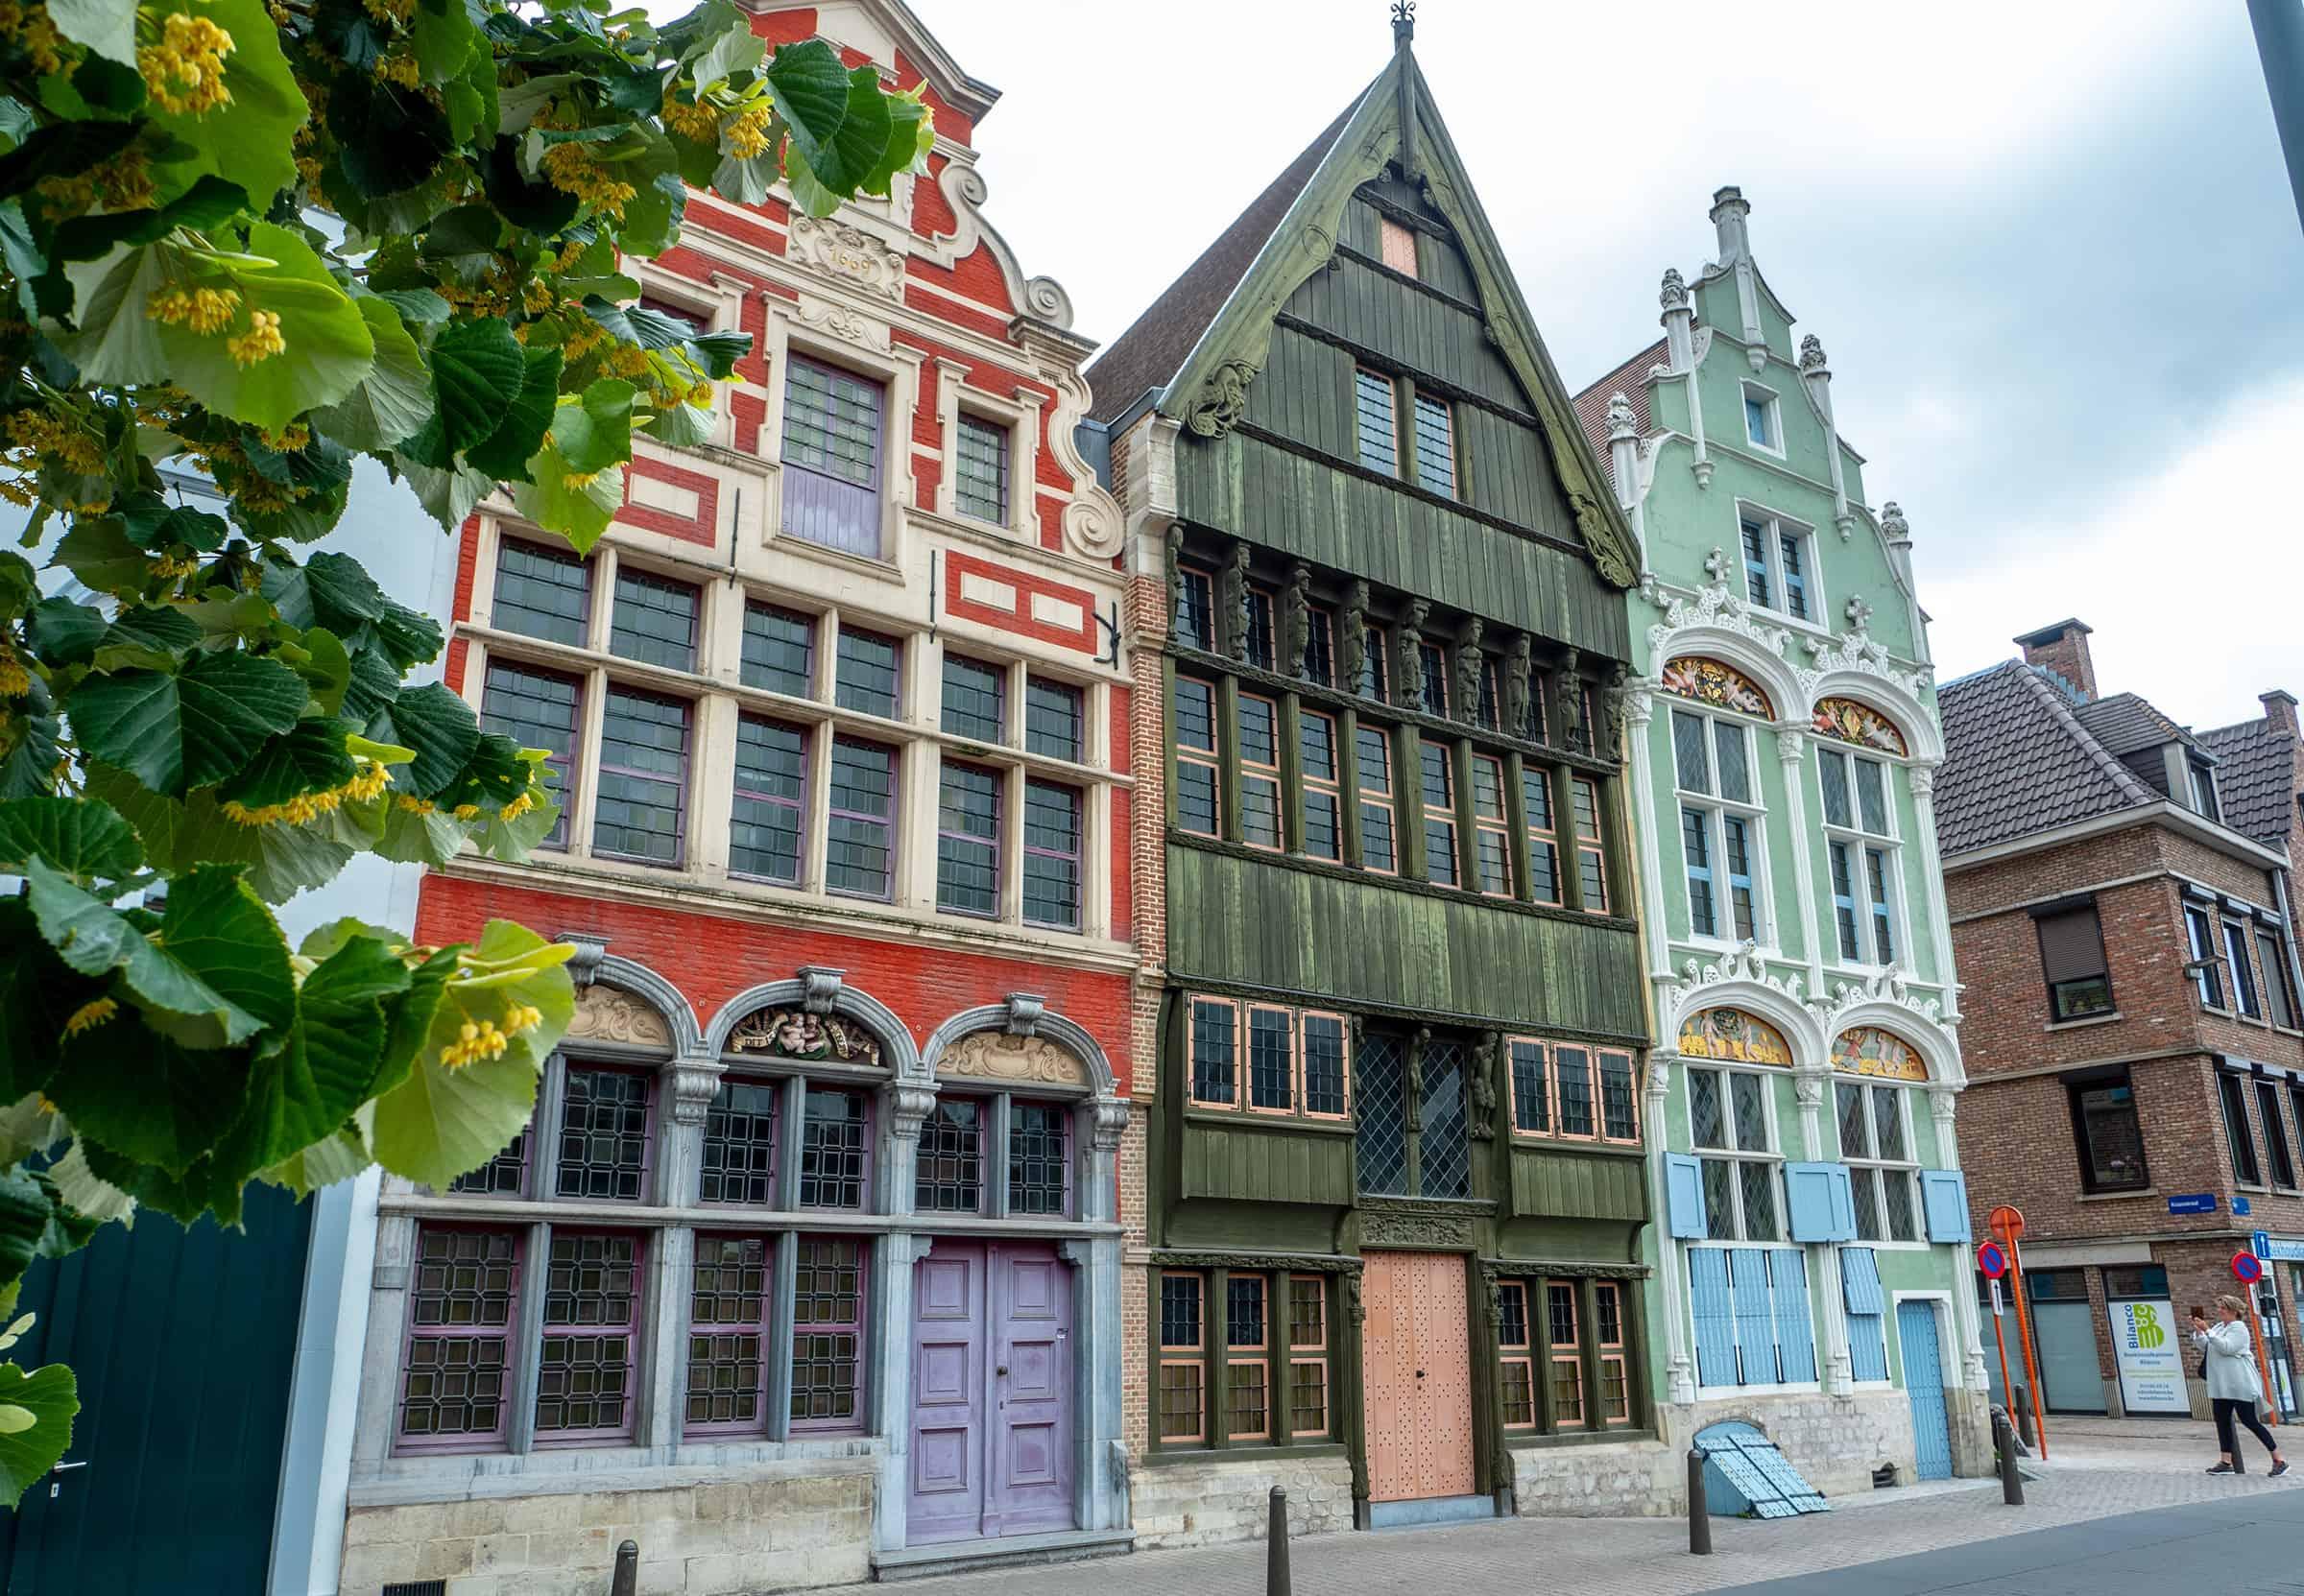 Haverwerf in Mechelen